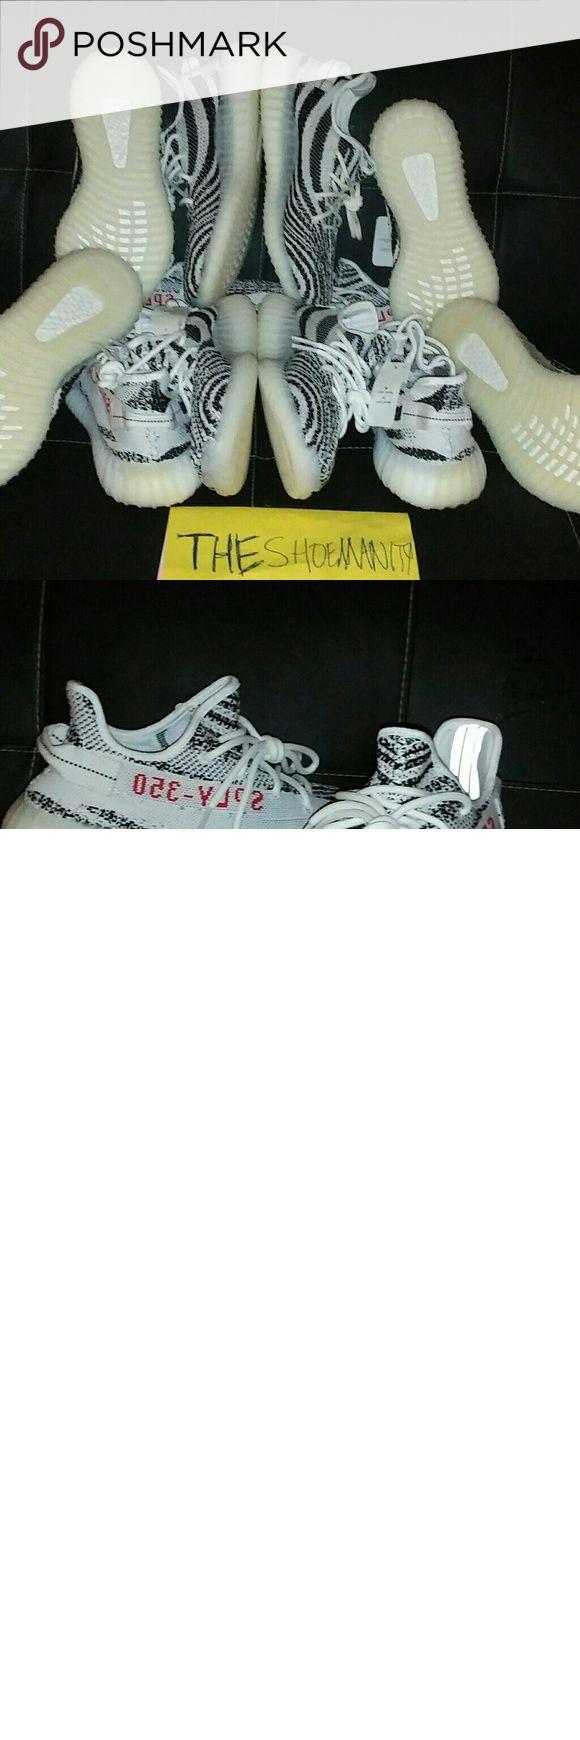 Adidas Yeezy 350 v2 Zebra Yeezy Brand new in box Multiple sizes available  Satisfaction Guaranteed,